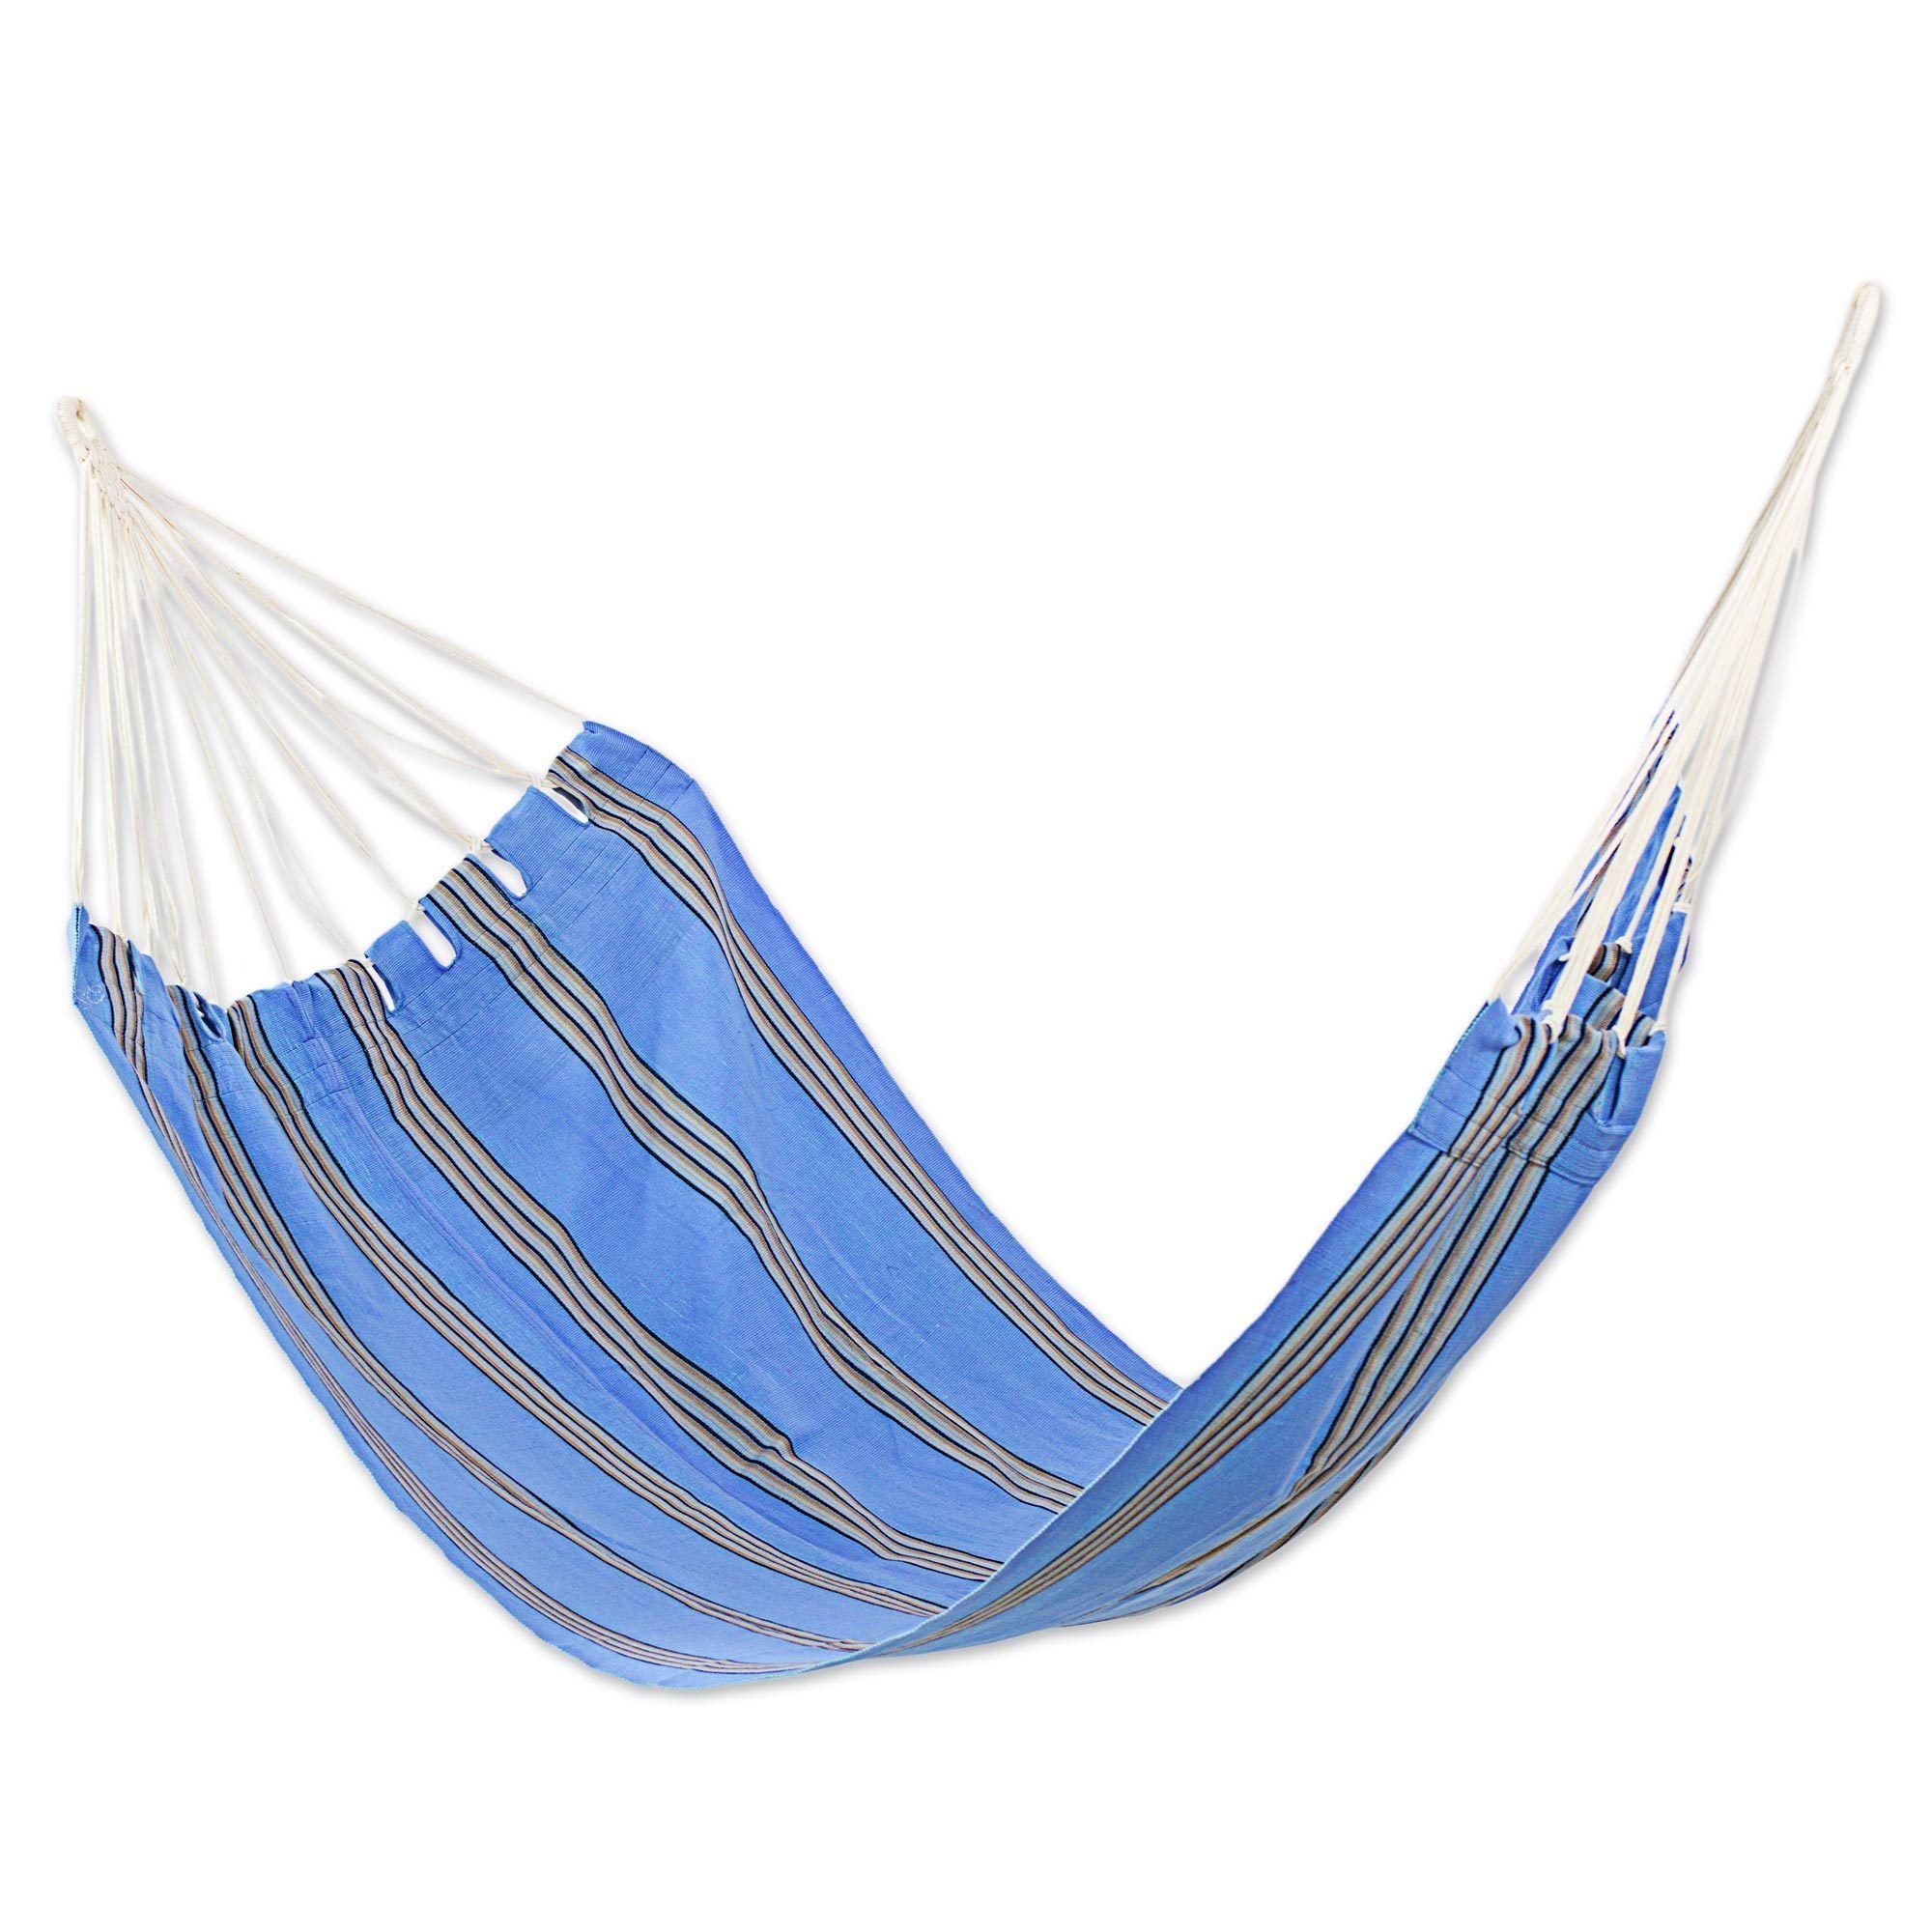 chichen hammocks mexican products yucatan hammock warimba handmade in mexico